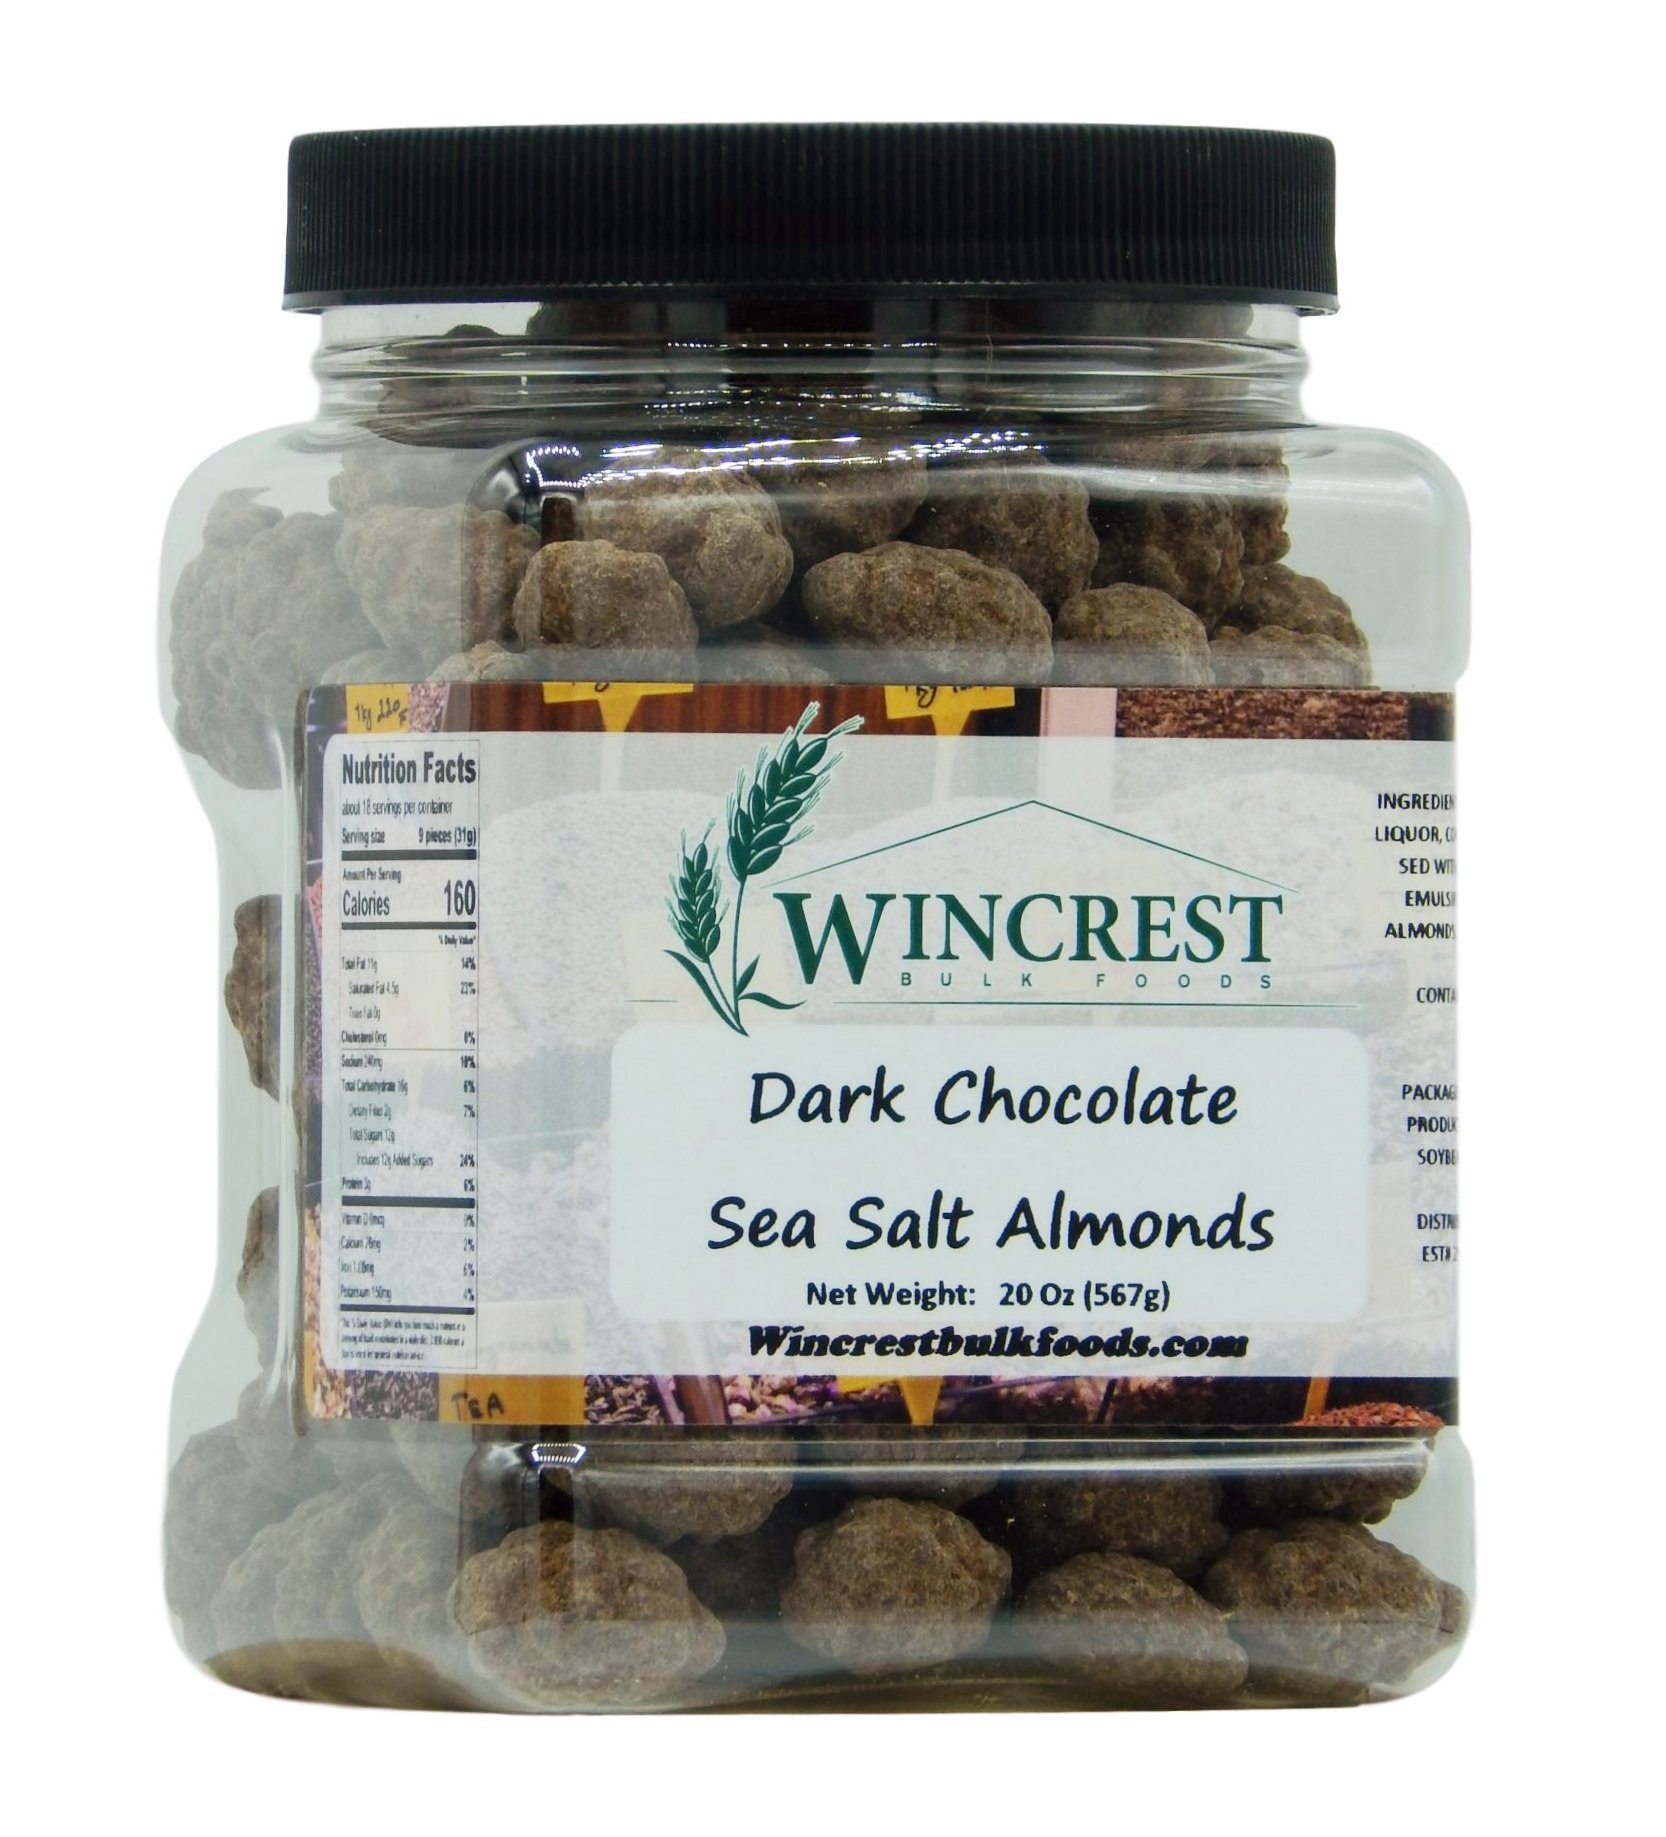 Dark Chocolate Turbinado & Sea Salt Almonds - 1.25 Lb Tub